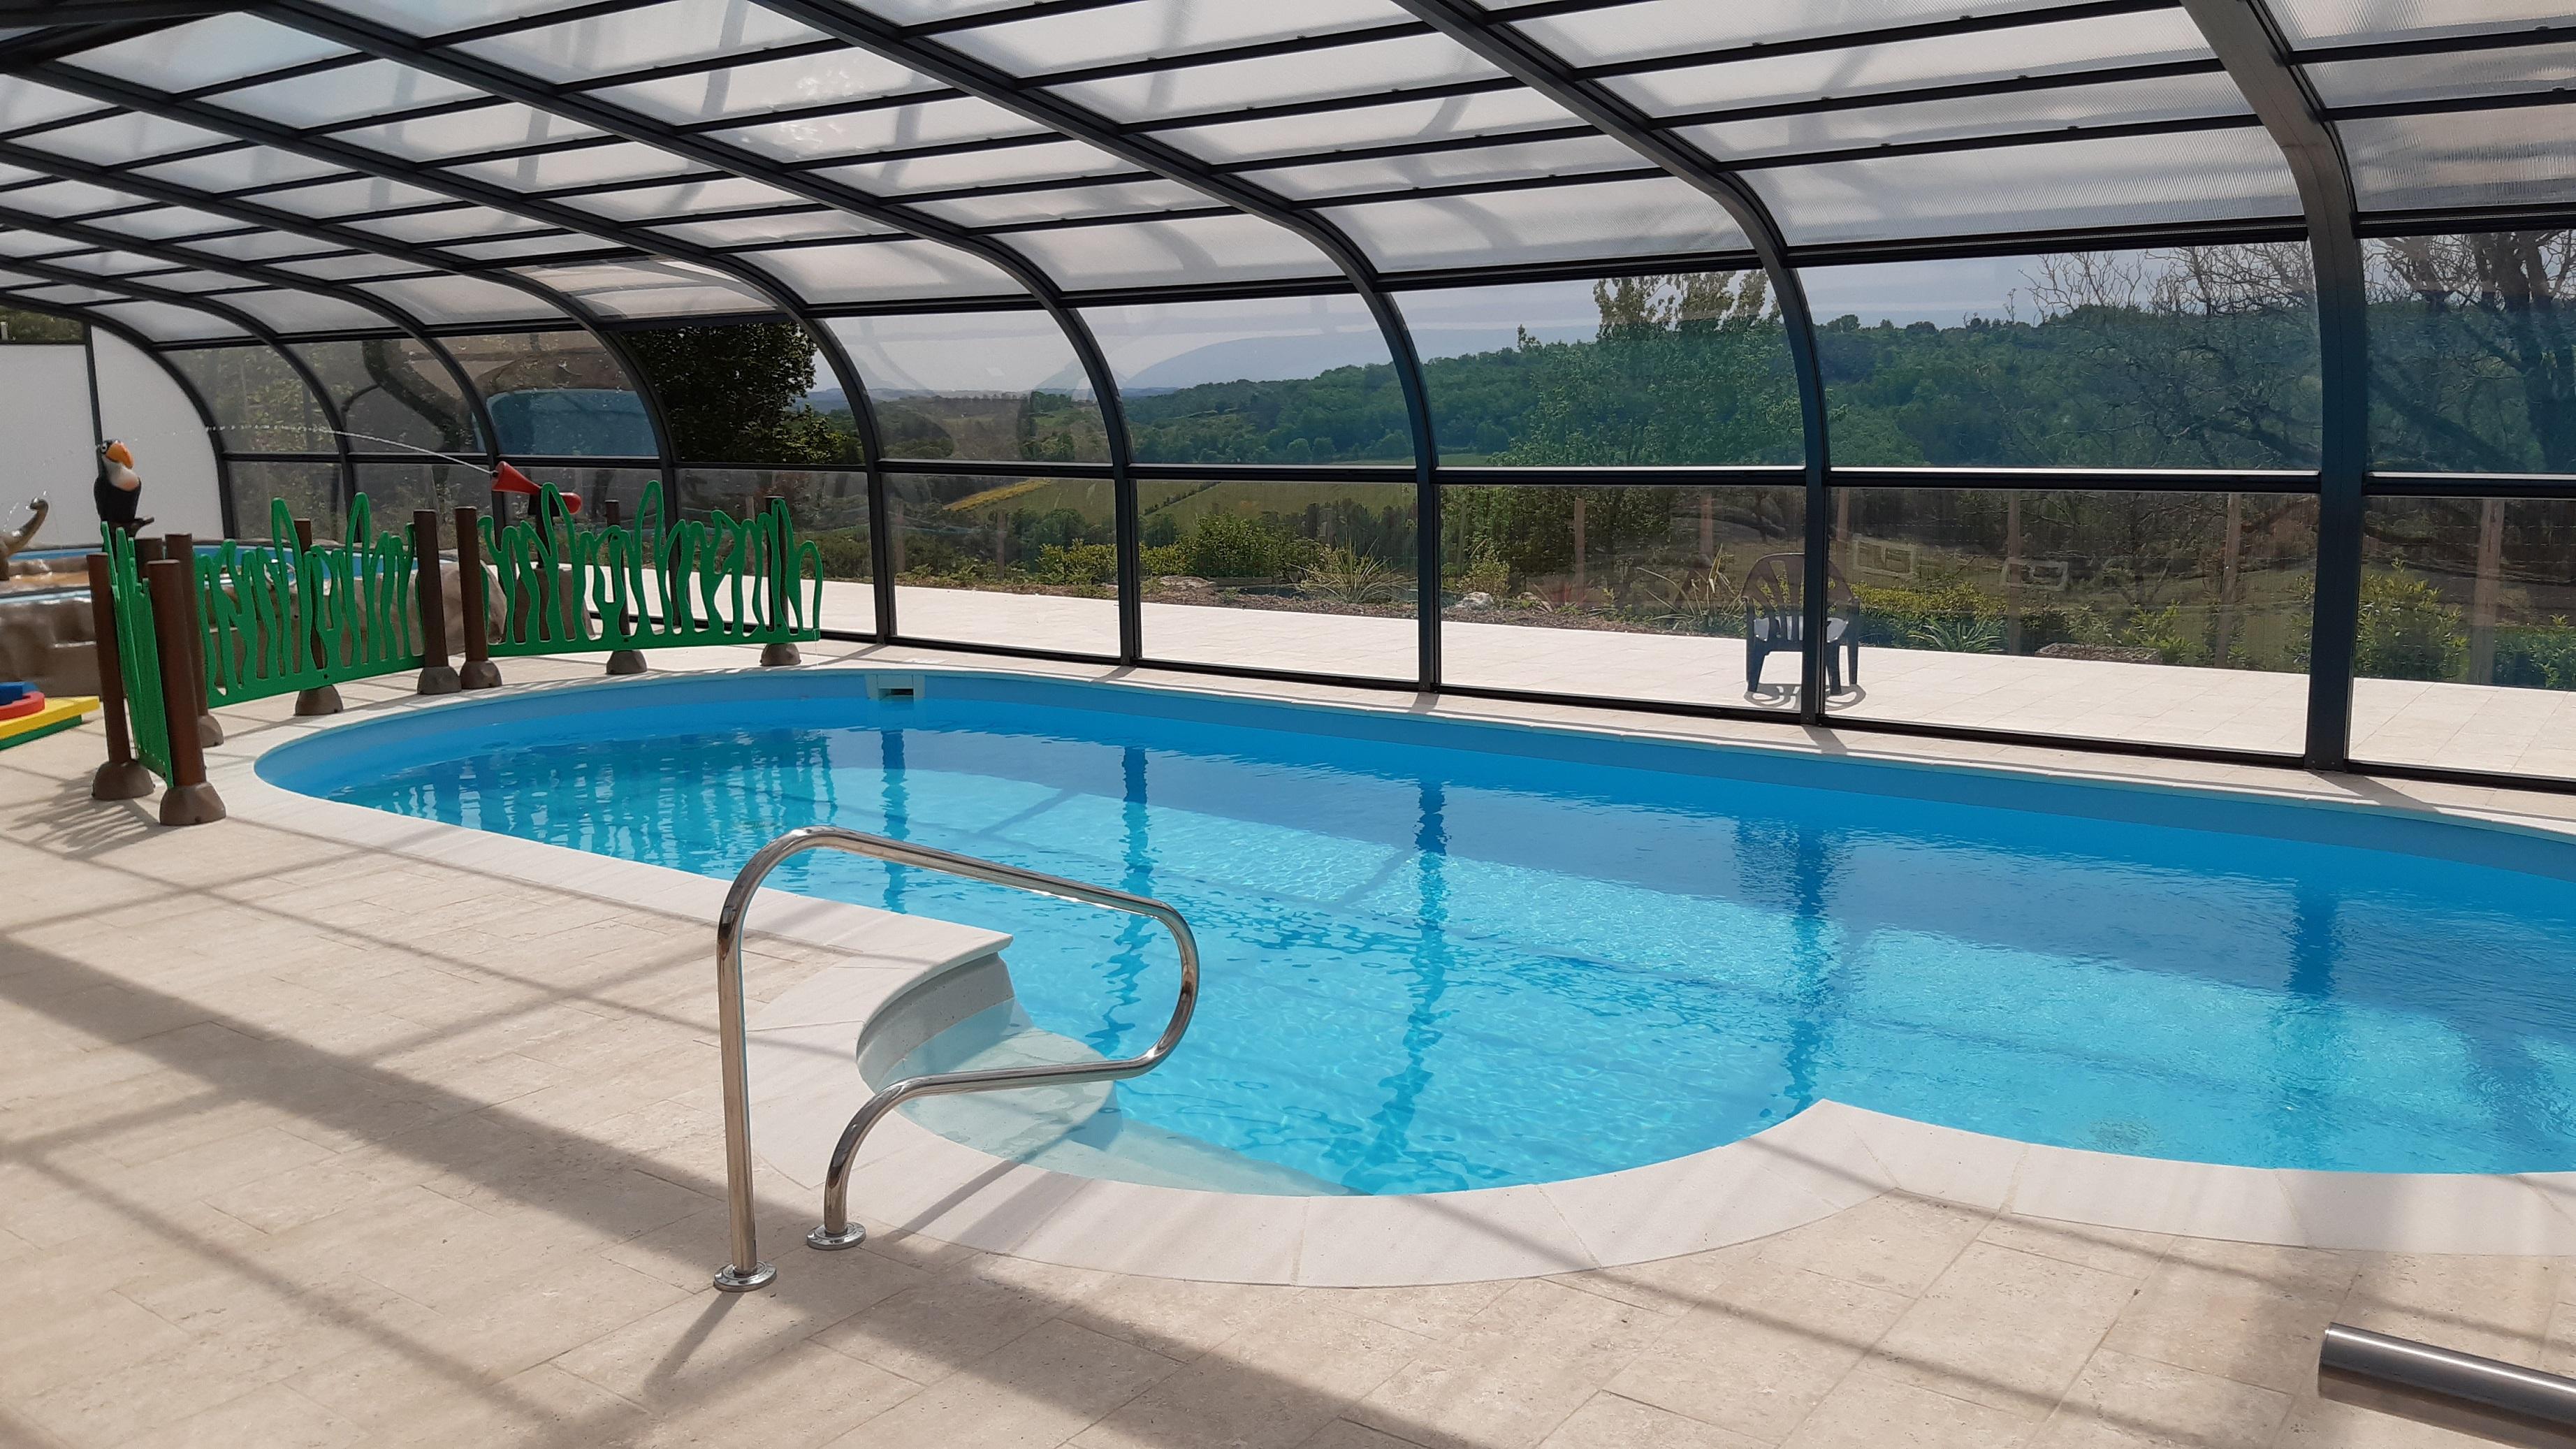 Camping Bleu Soleil, Rouffignac-Saint-Cernin-de-Reilhac, Dordogne